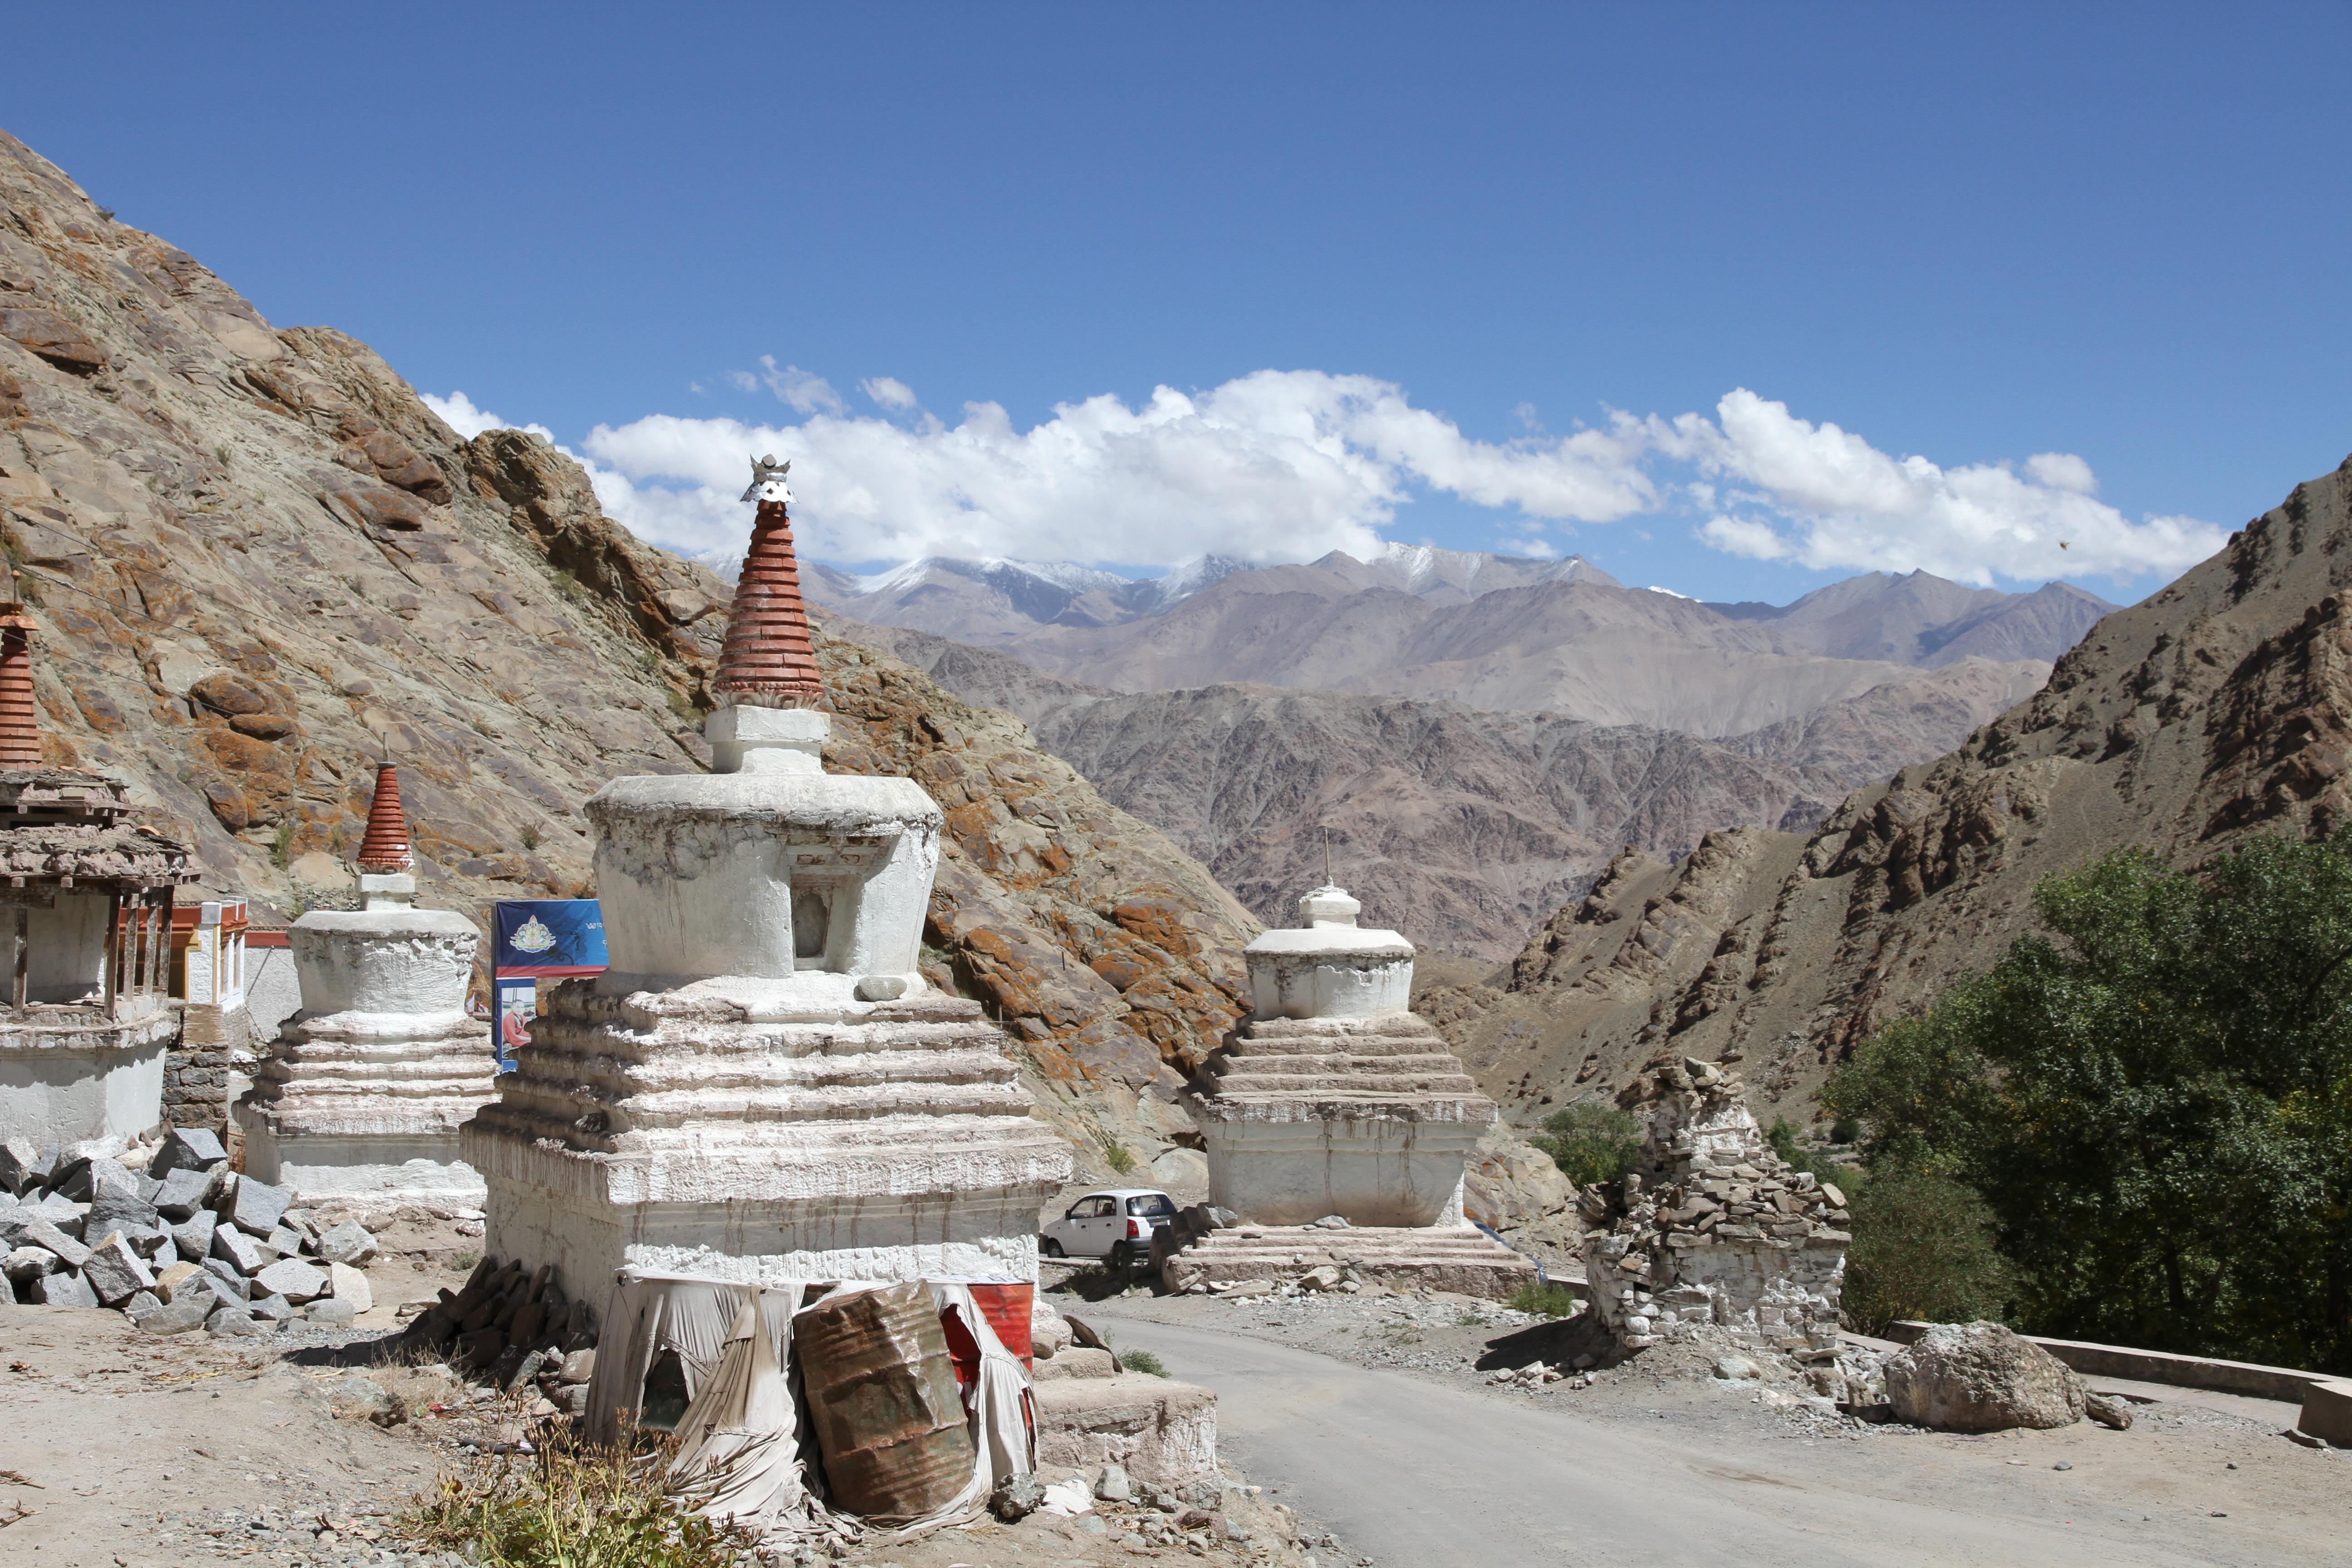 Ladakh, Indien, Himalaya, Reise, Reisefeder, travel, travelblog, Reiseblogger